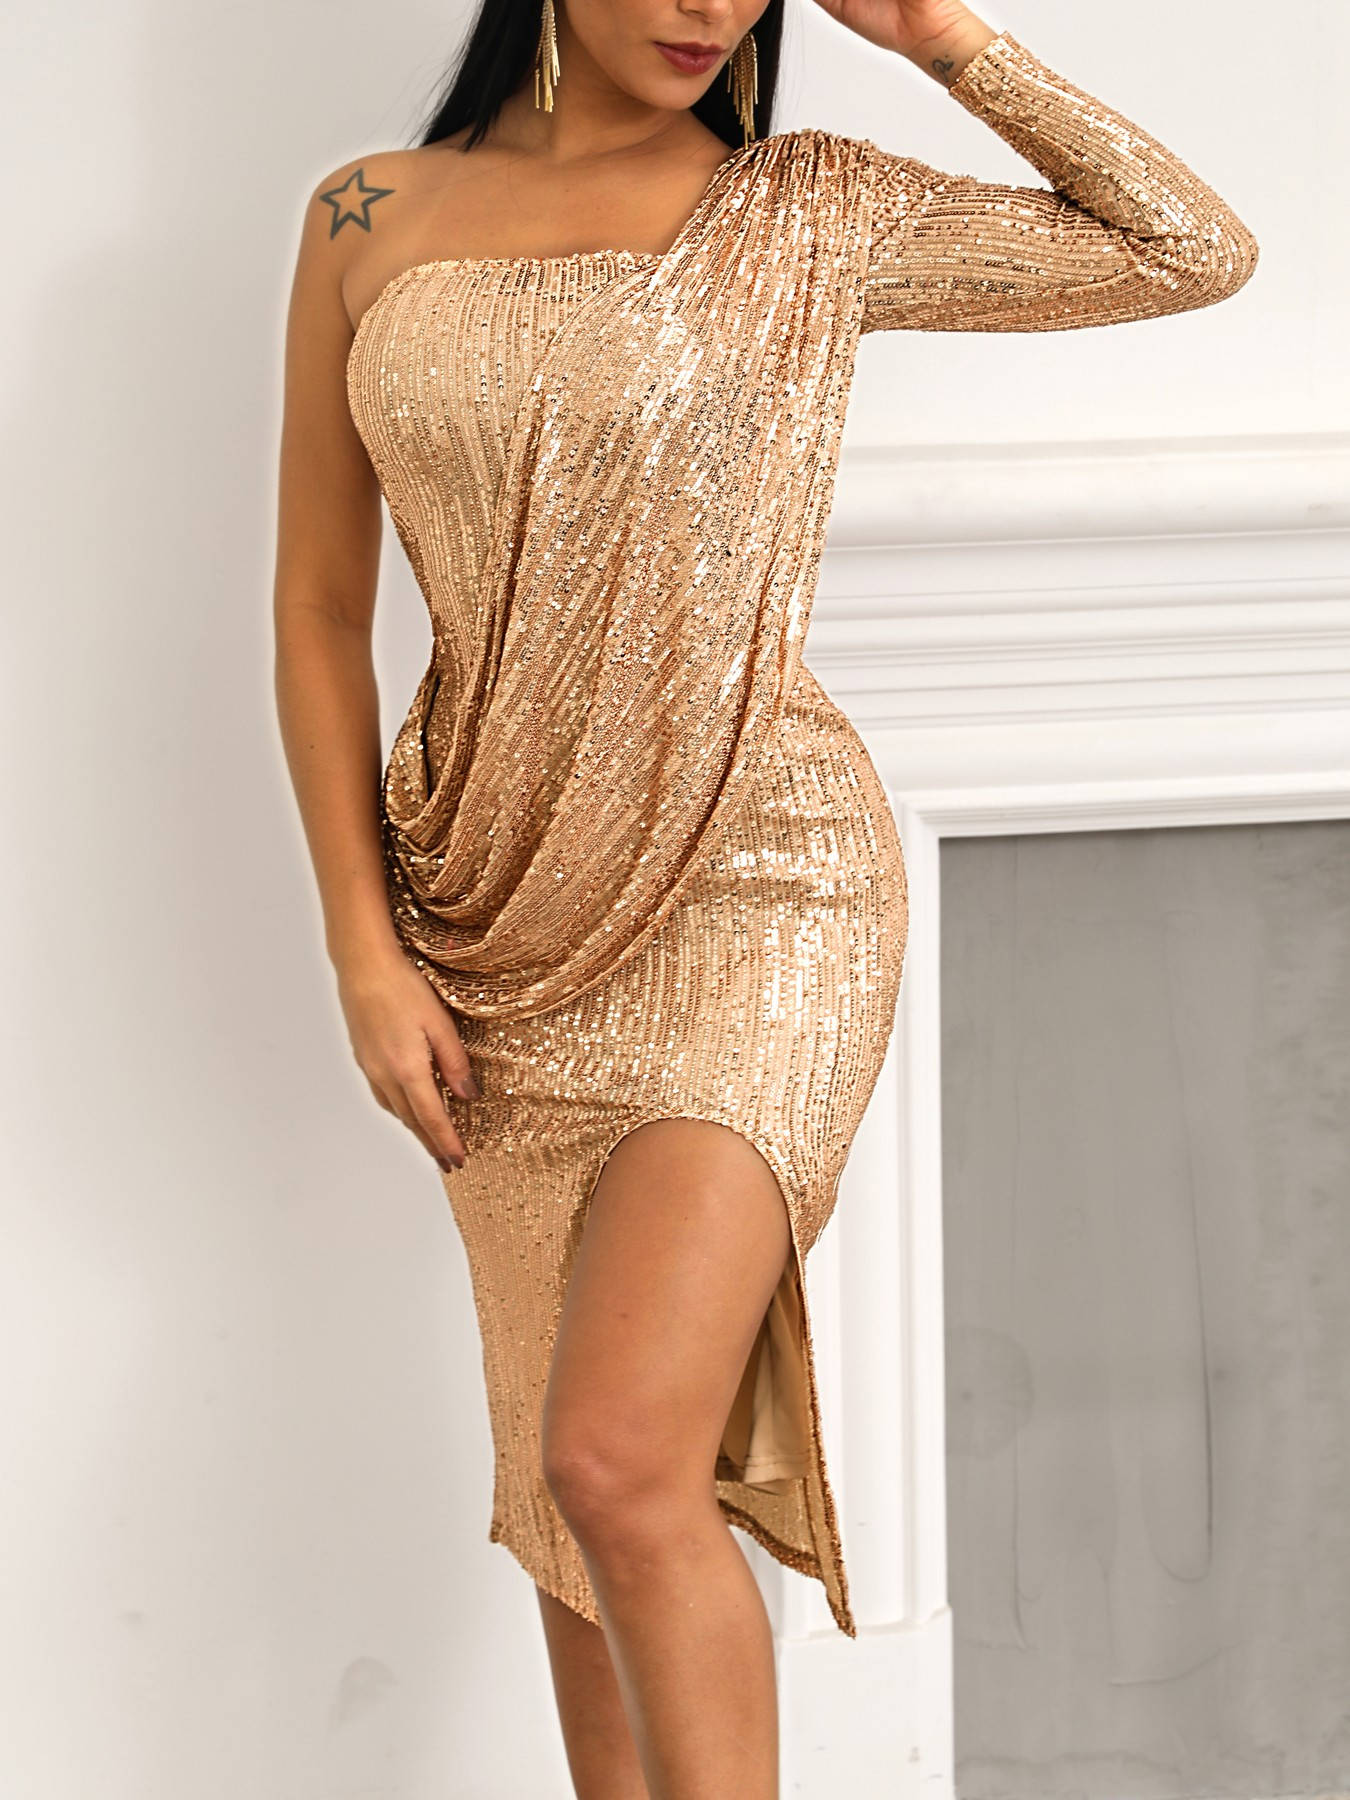 boutiquefeel / Sequin One Shoulder Drape Design Slit Party Dress